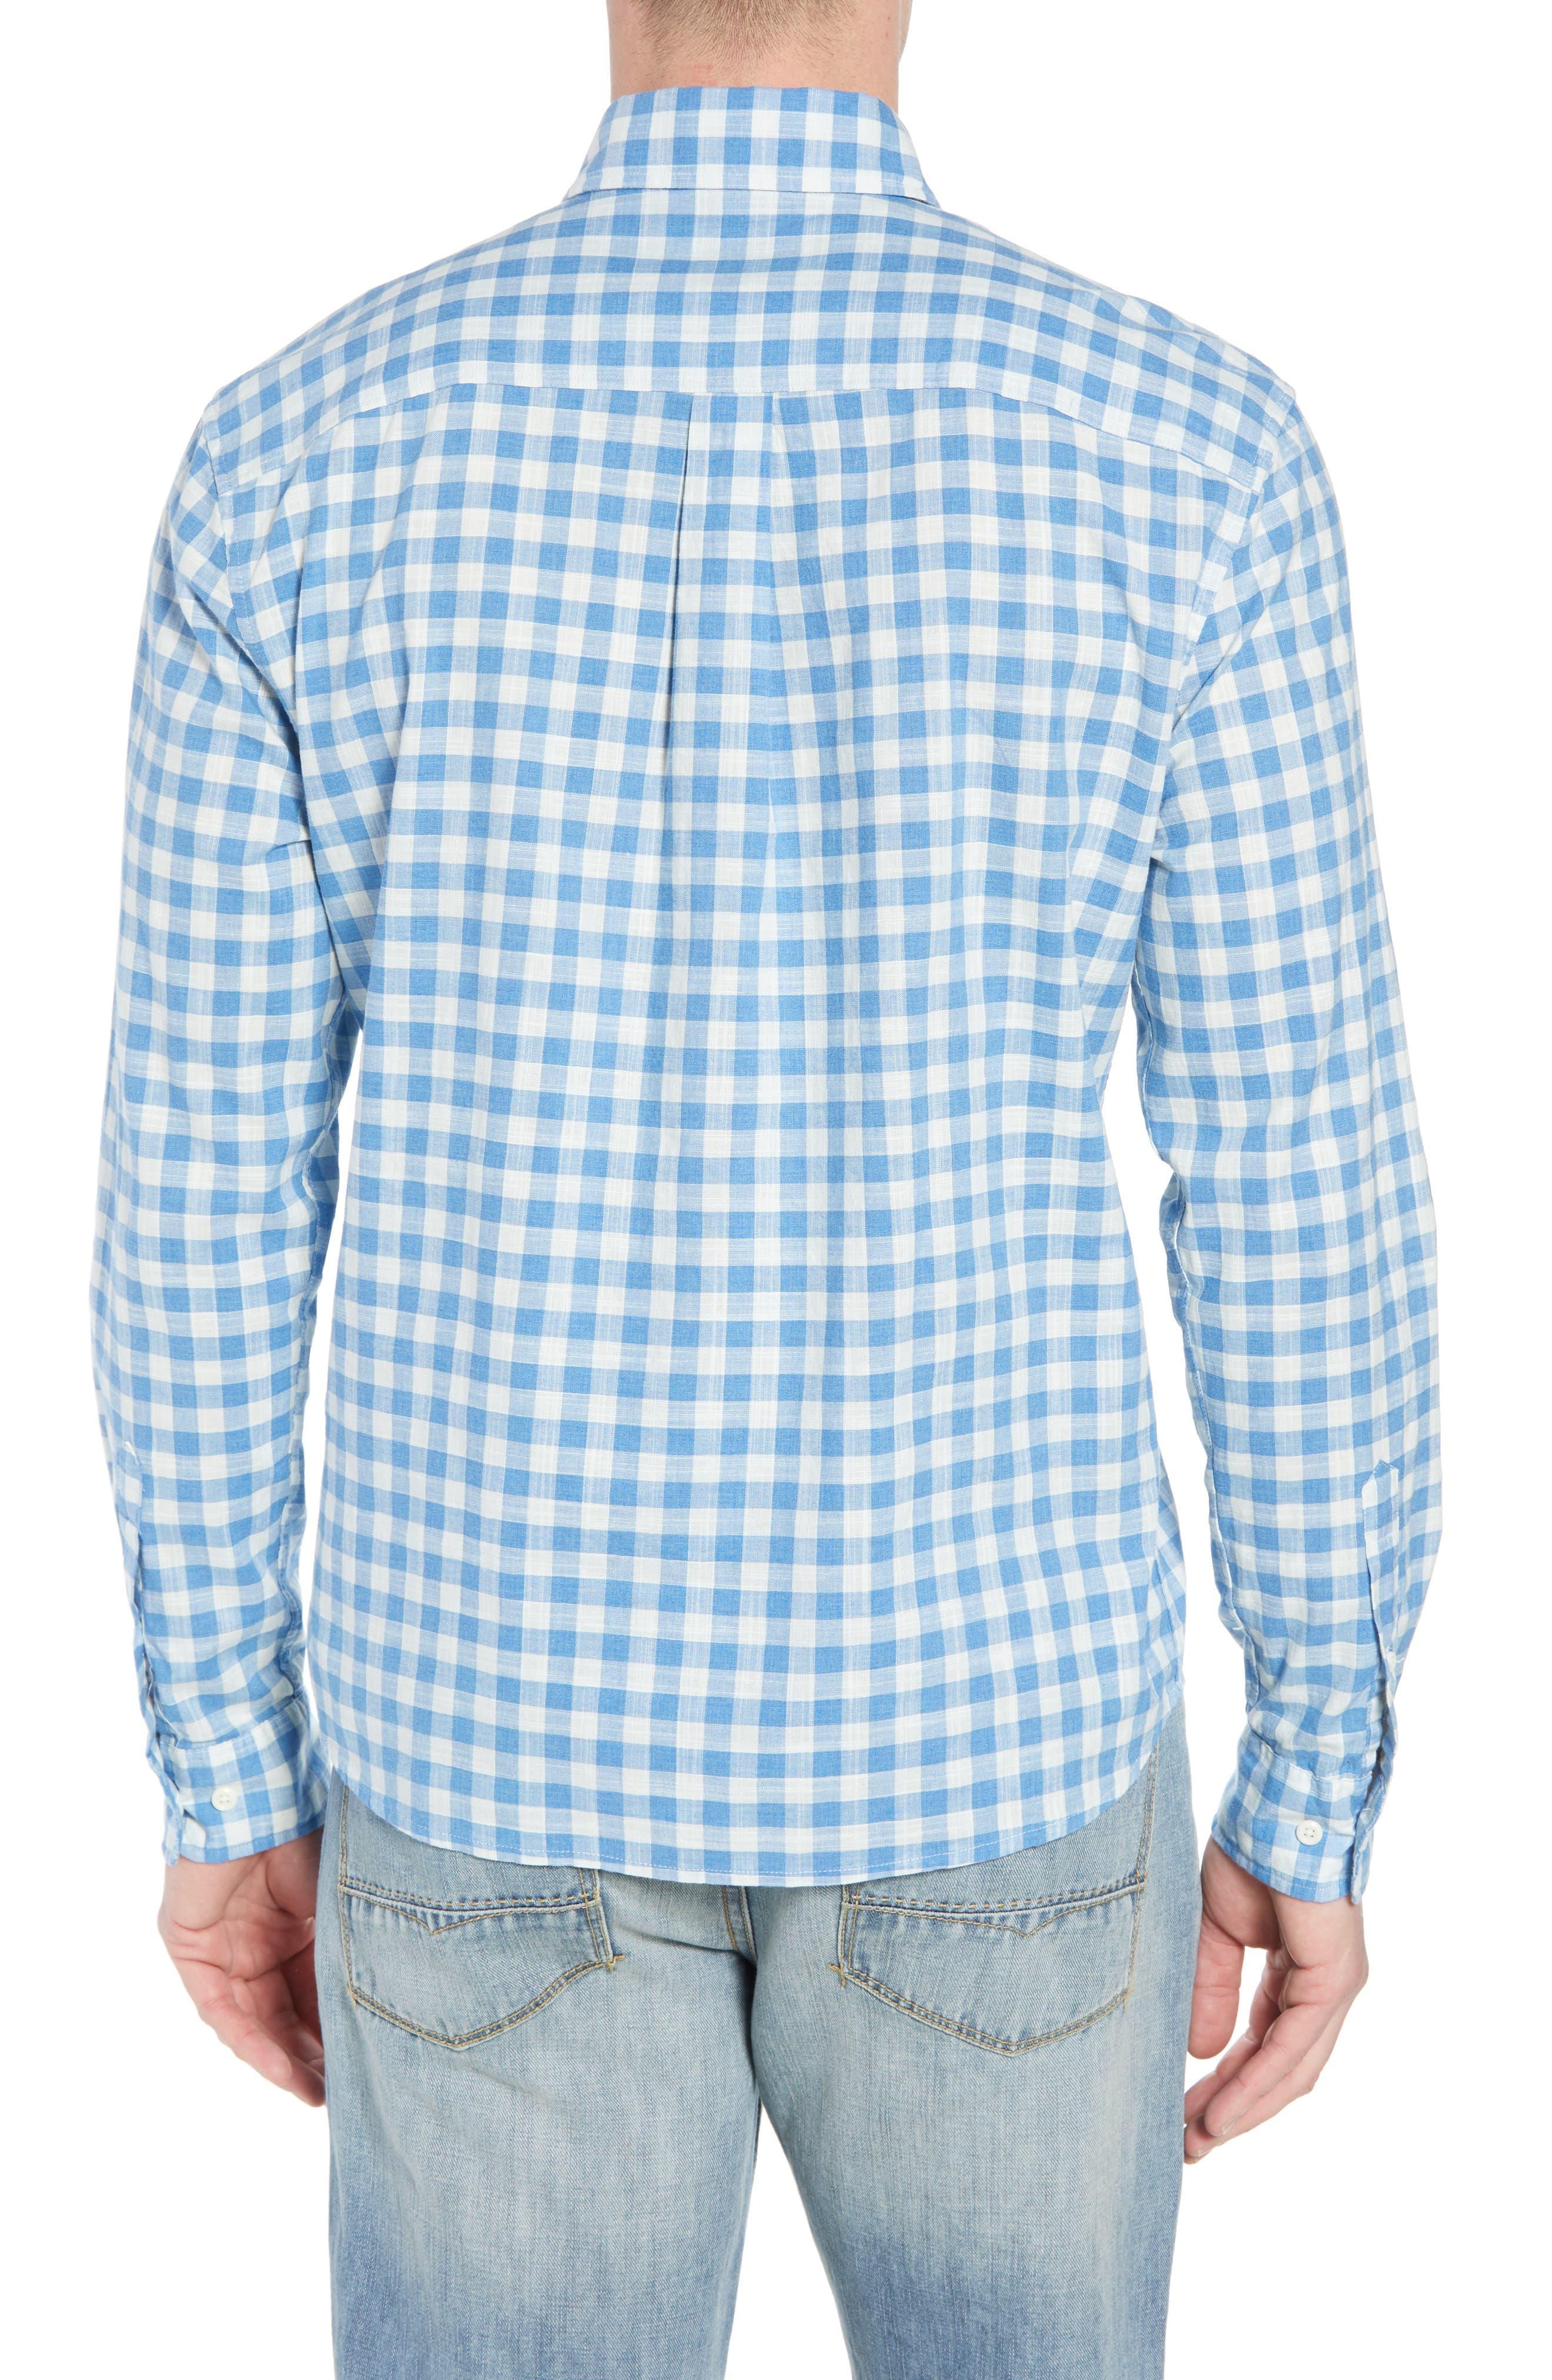 Watts Regular Fit Sport Shirt,                             Alternate thumbnail 2, color,                             200